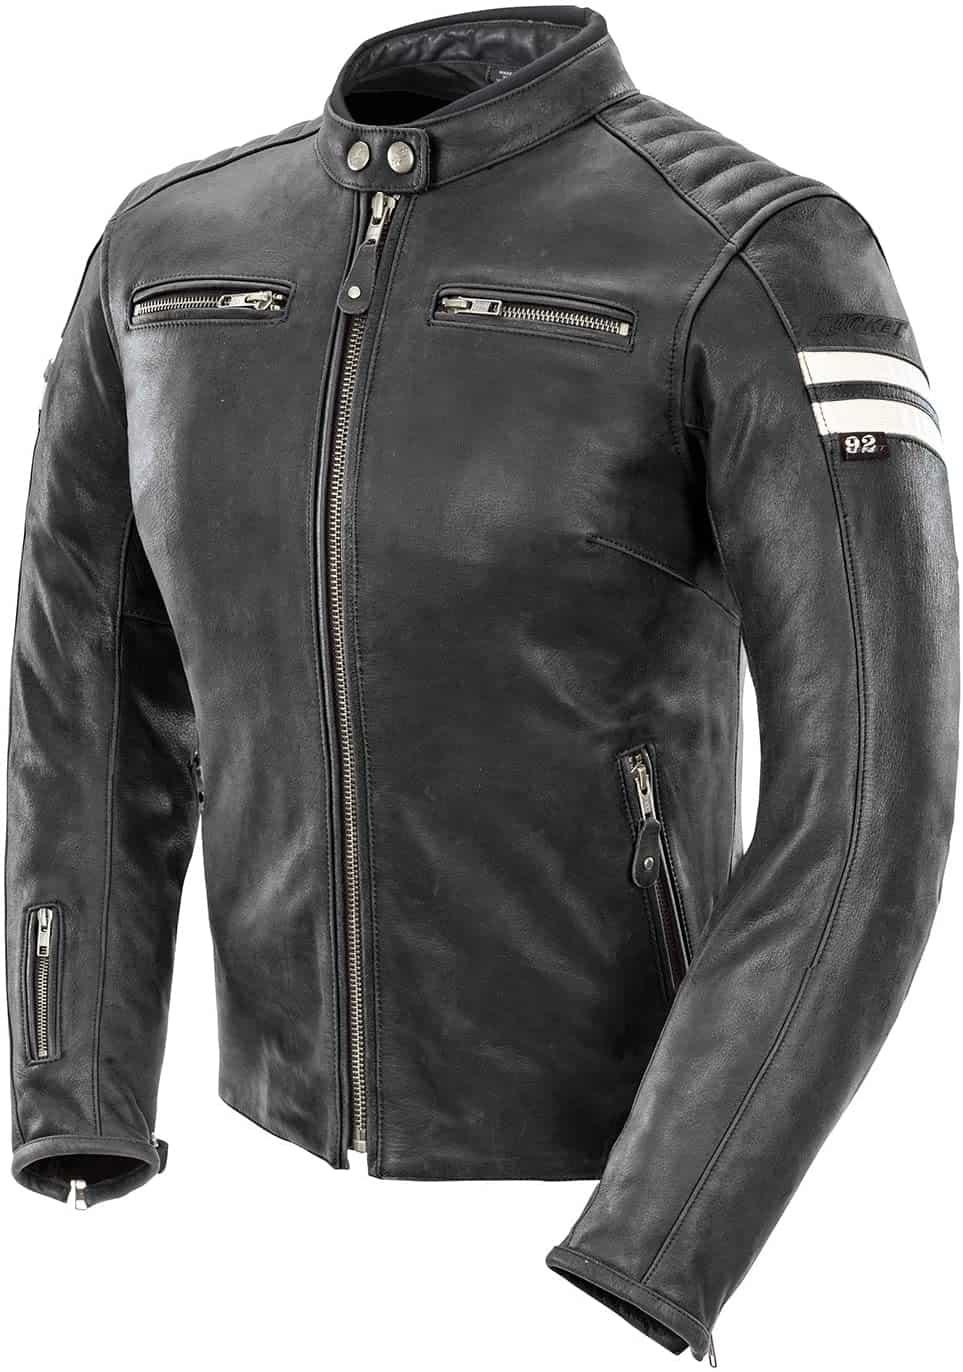 Joe-Rocket-Classic-Women-Leather-Motorcycle-Jacket